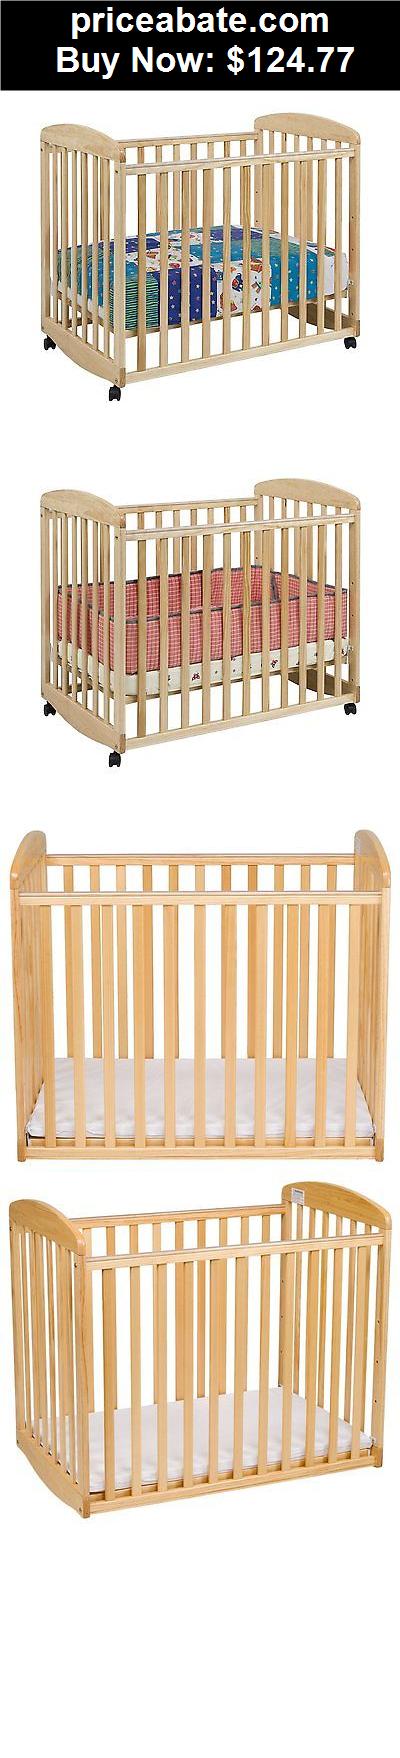 Baby New Davinci Alpha Mini Rocking Crib With 4 Level Mattress